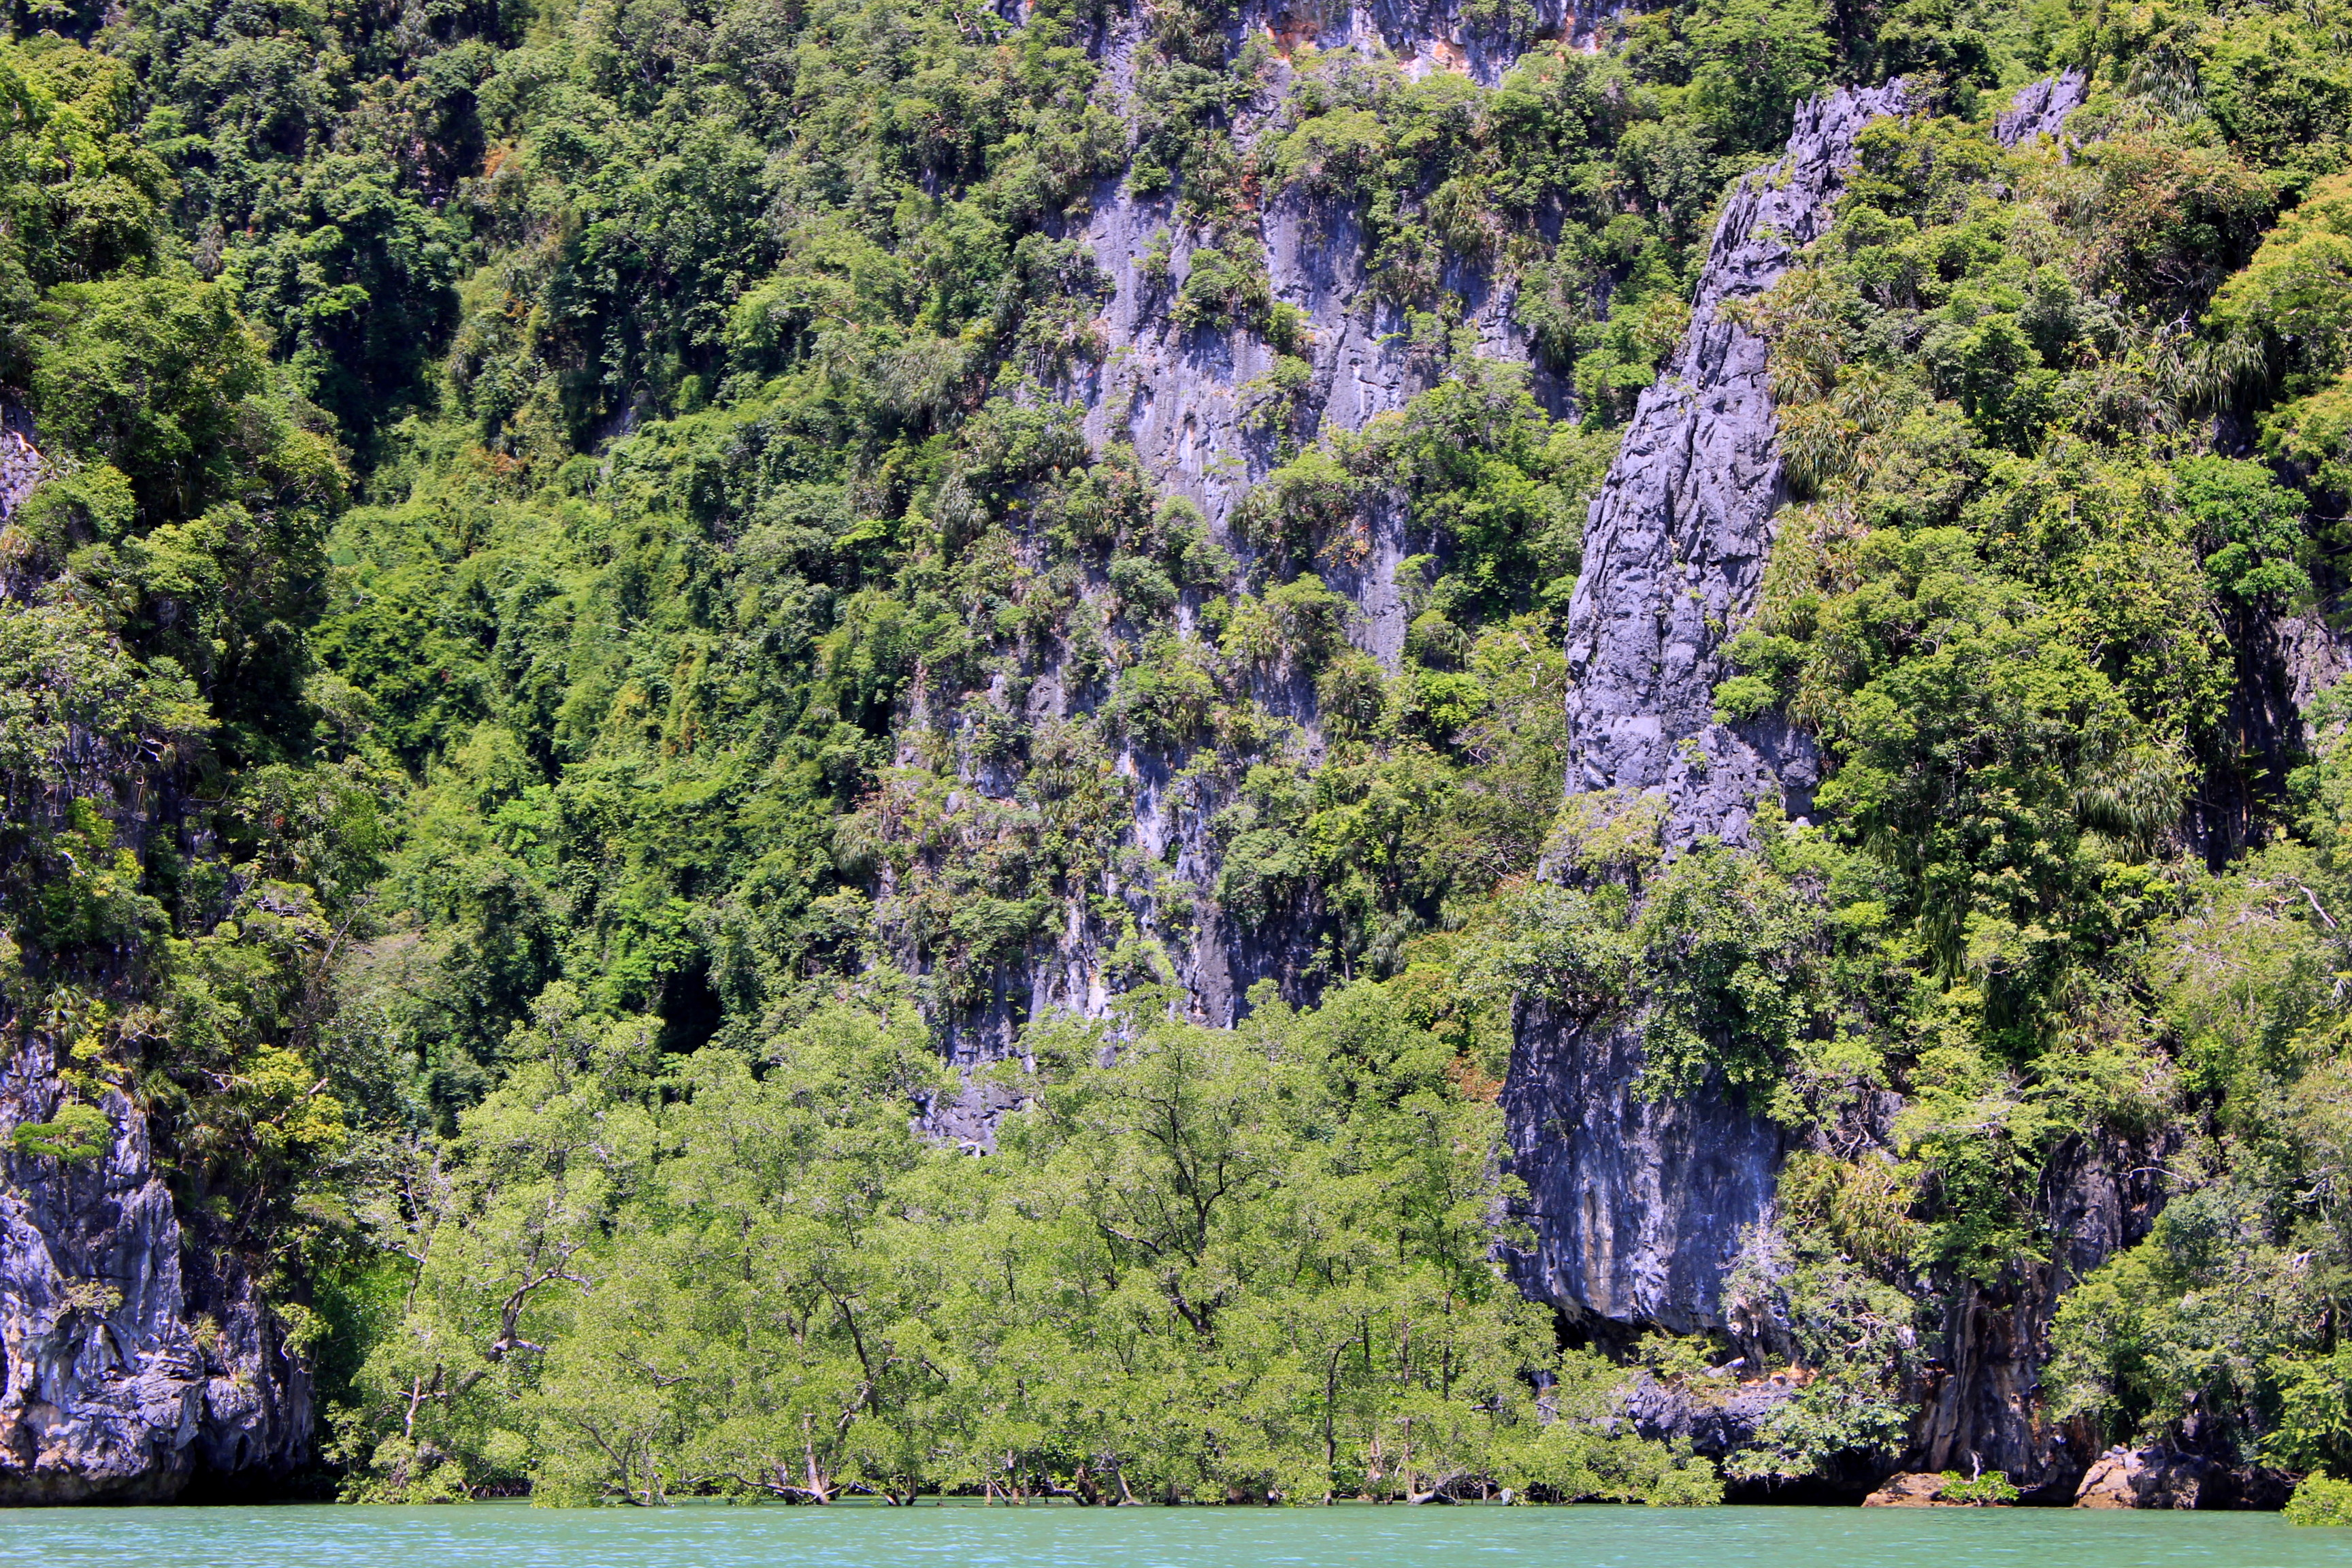 With dramatic limestone cliffs